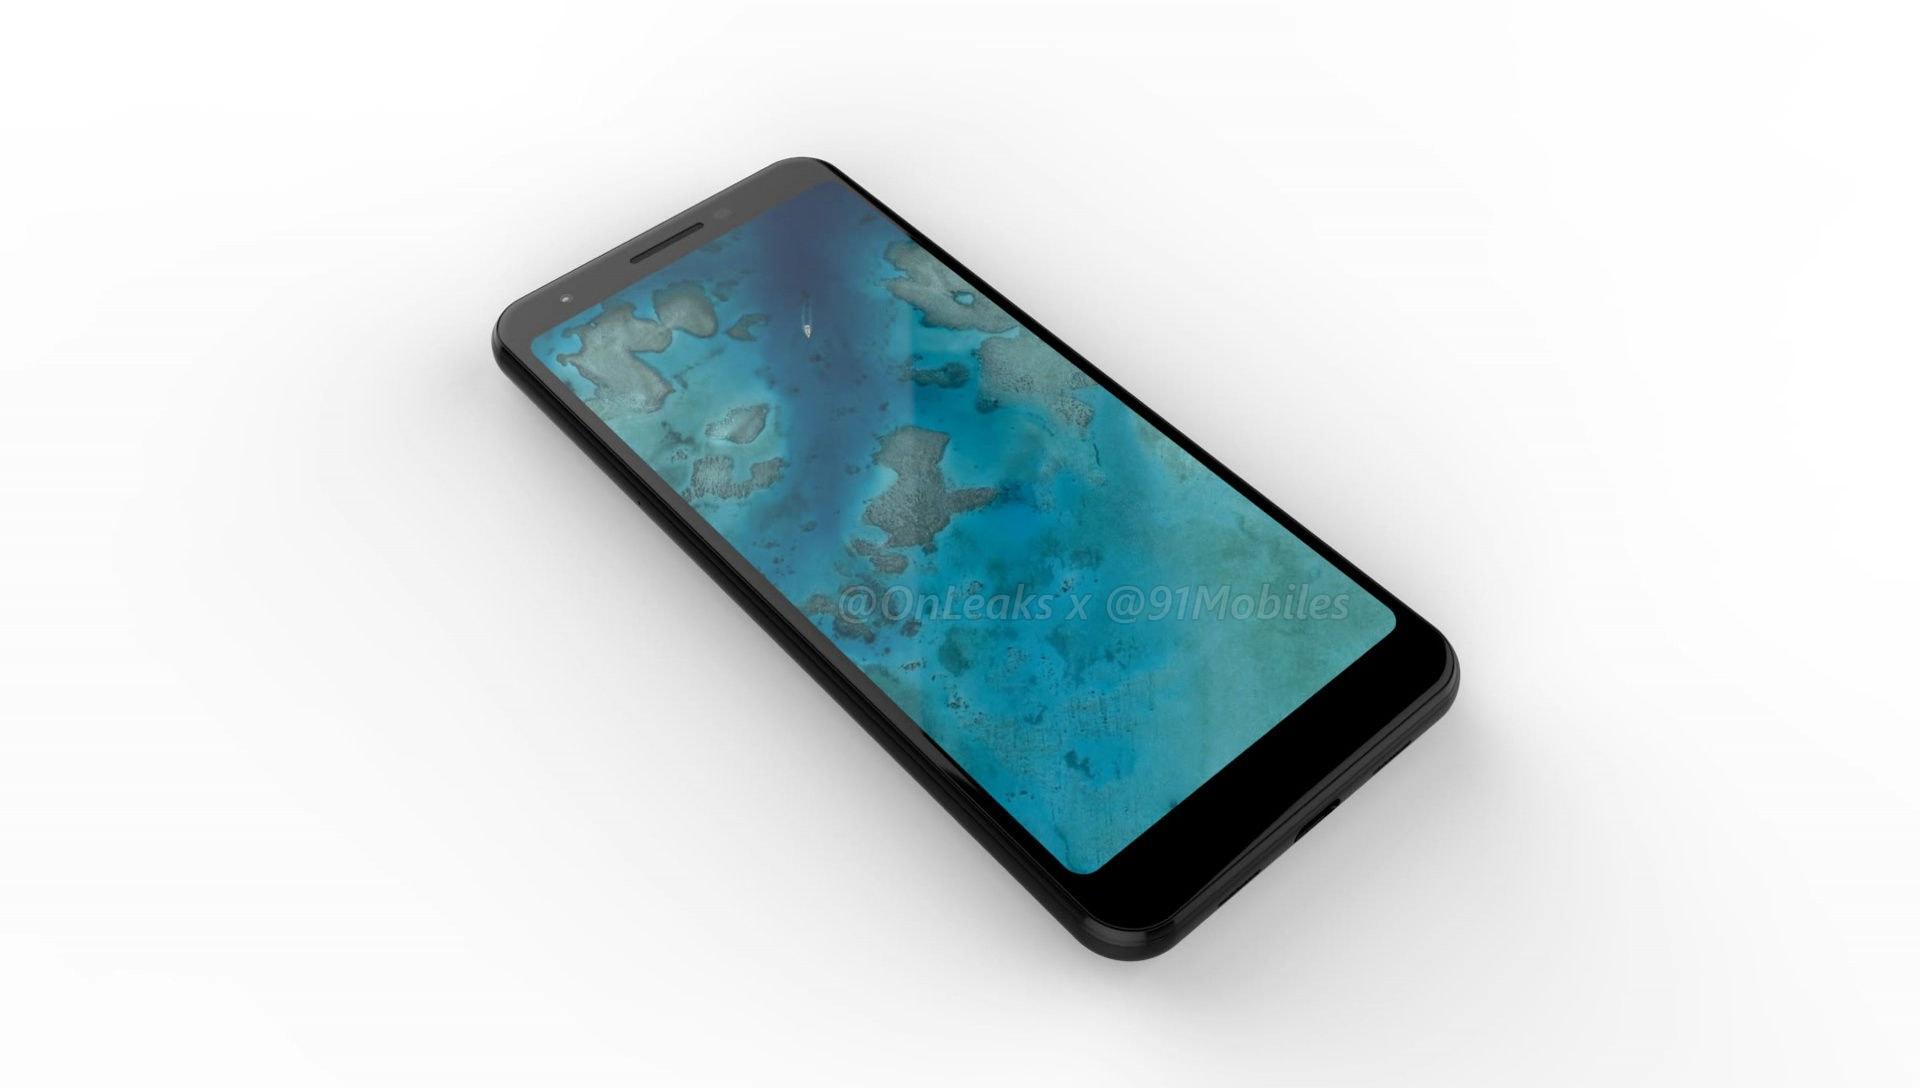 Google-Pixel-3-Lite-91mobiles-1